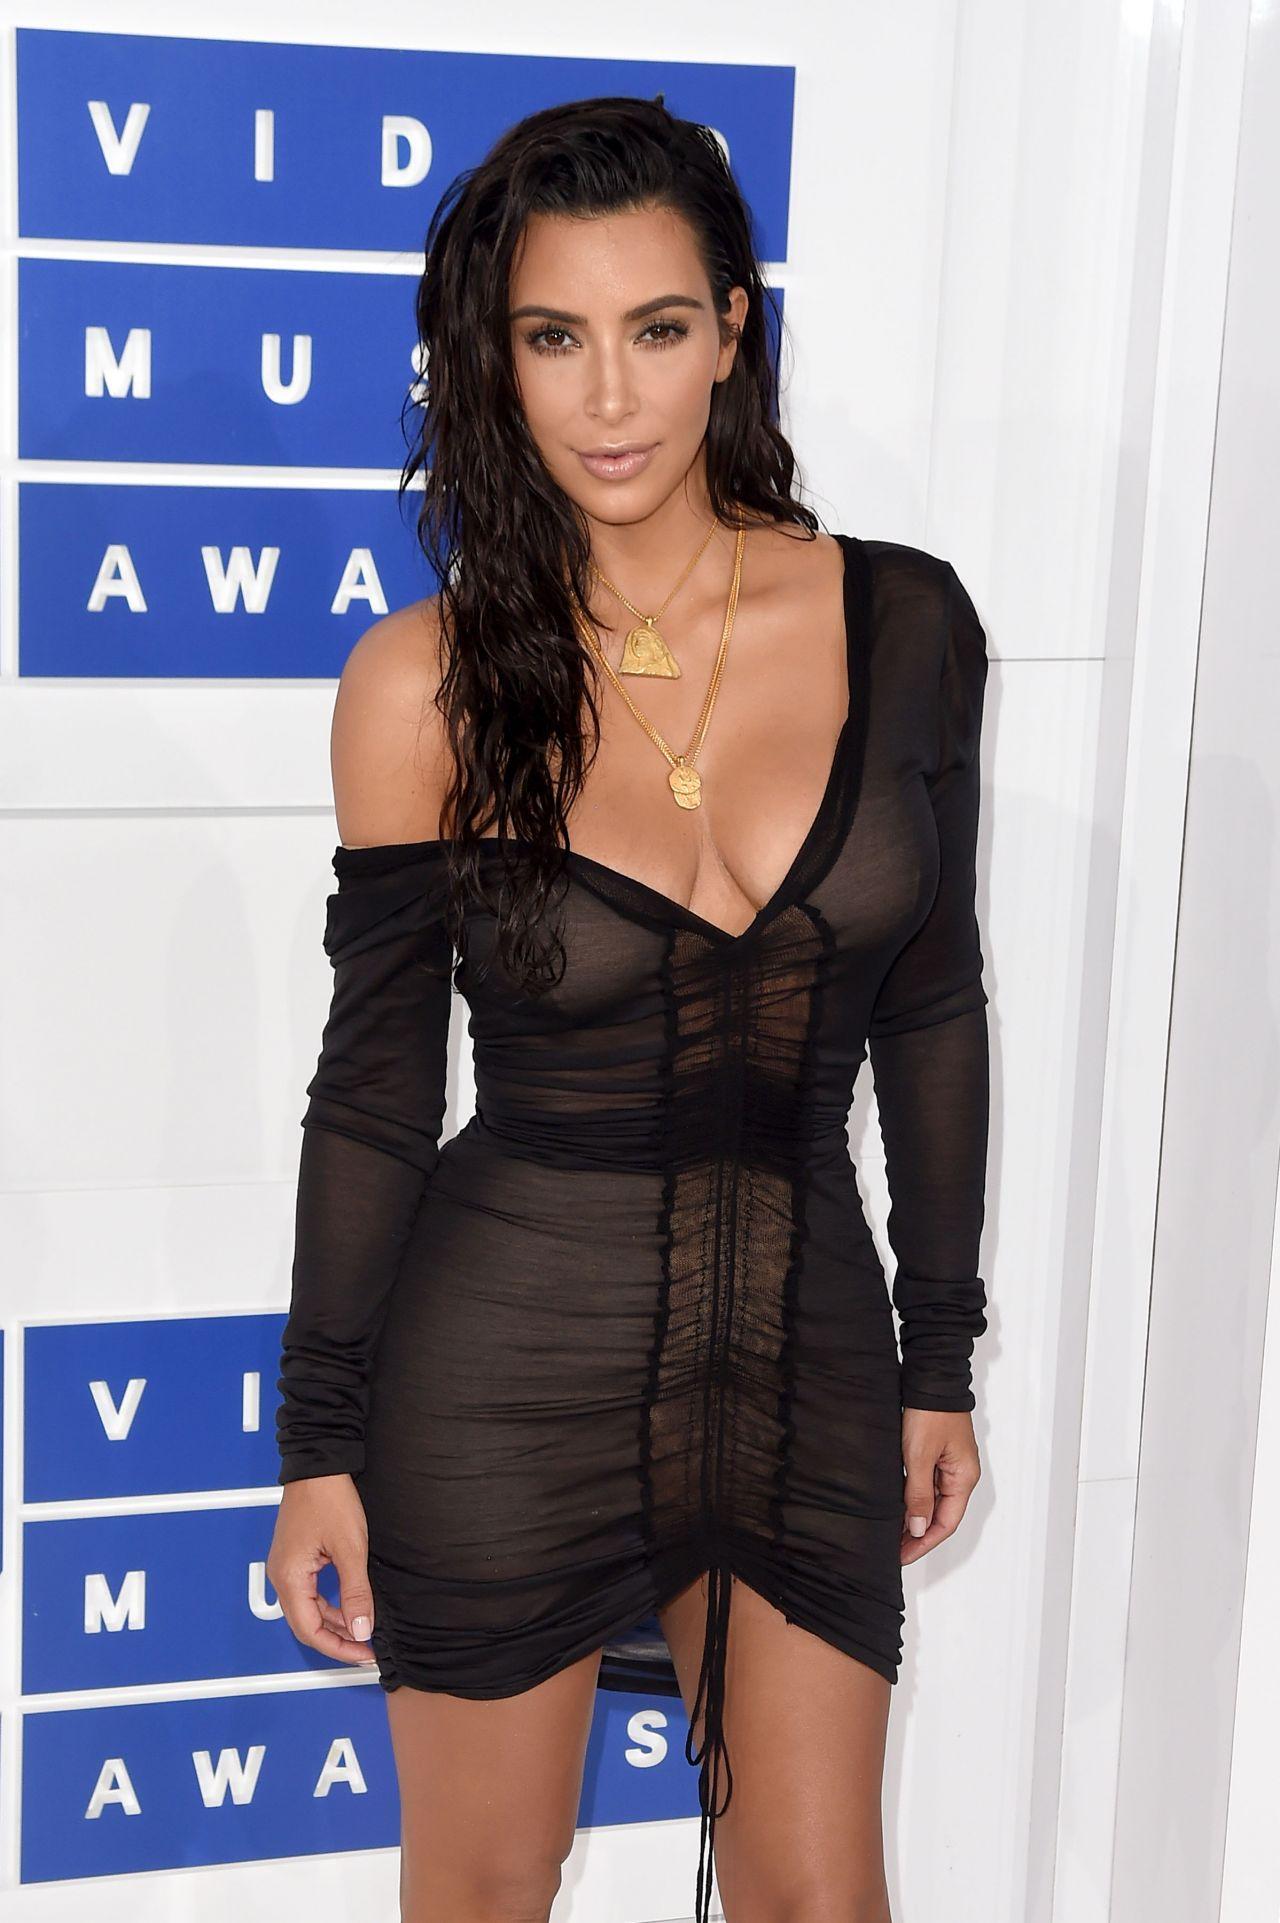 Kim Kardashian Mtv Video Music Awards 2016 In New York